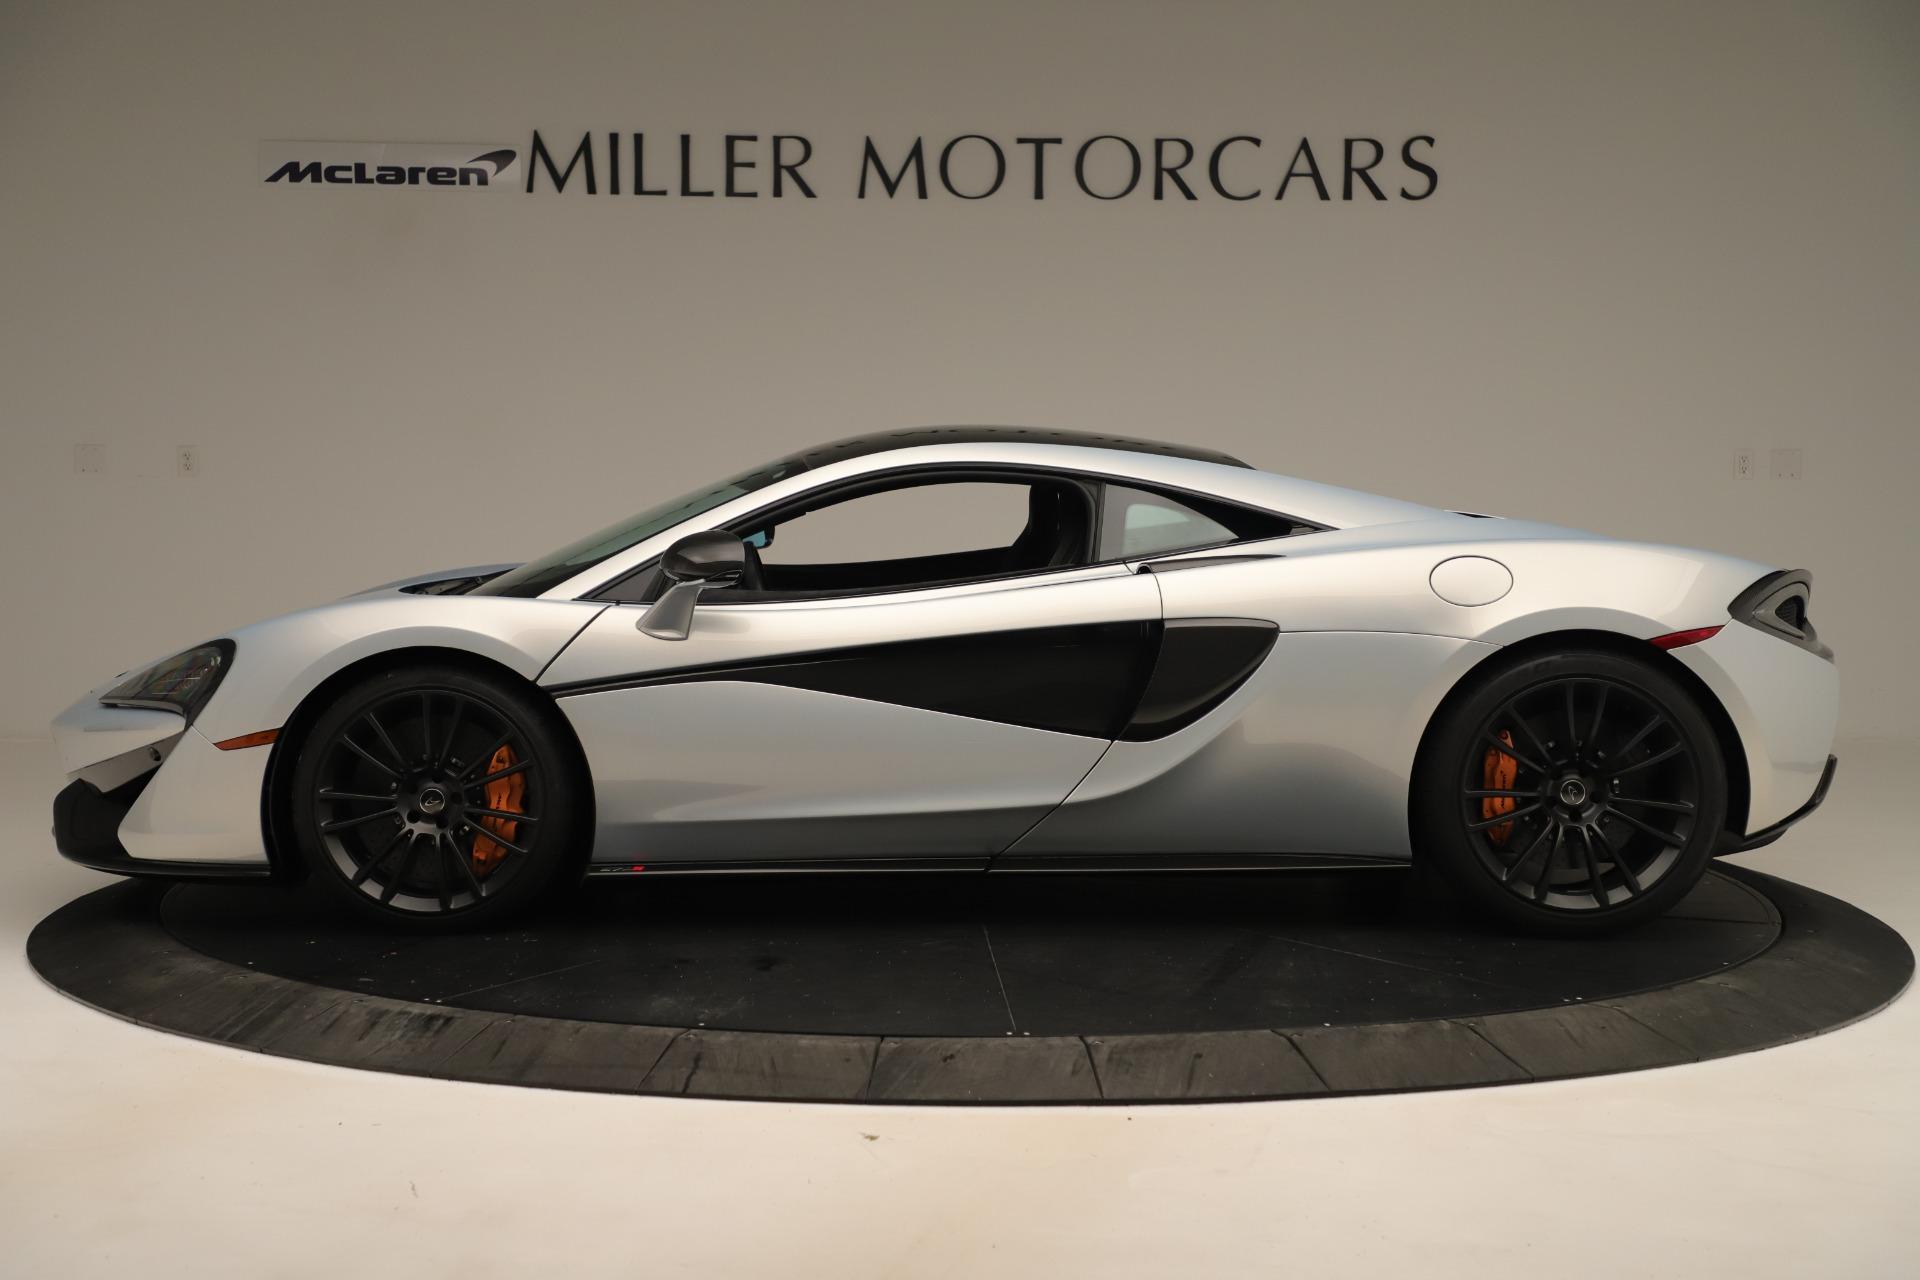 Used 2016 McLaren 570S Coupe For Sale In Westport, CT 3433_p2